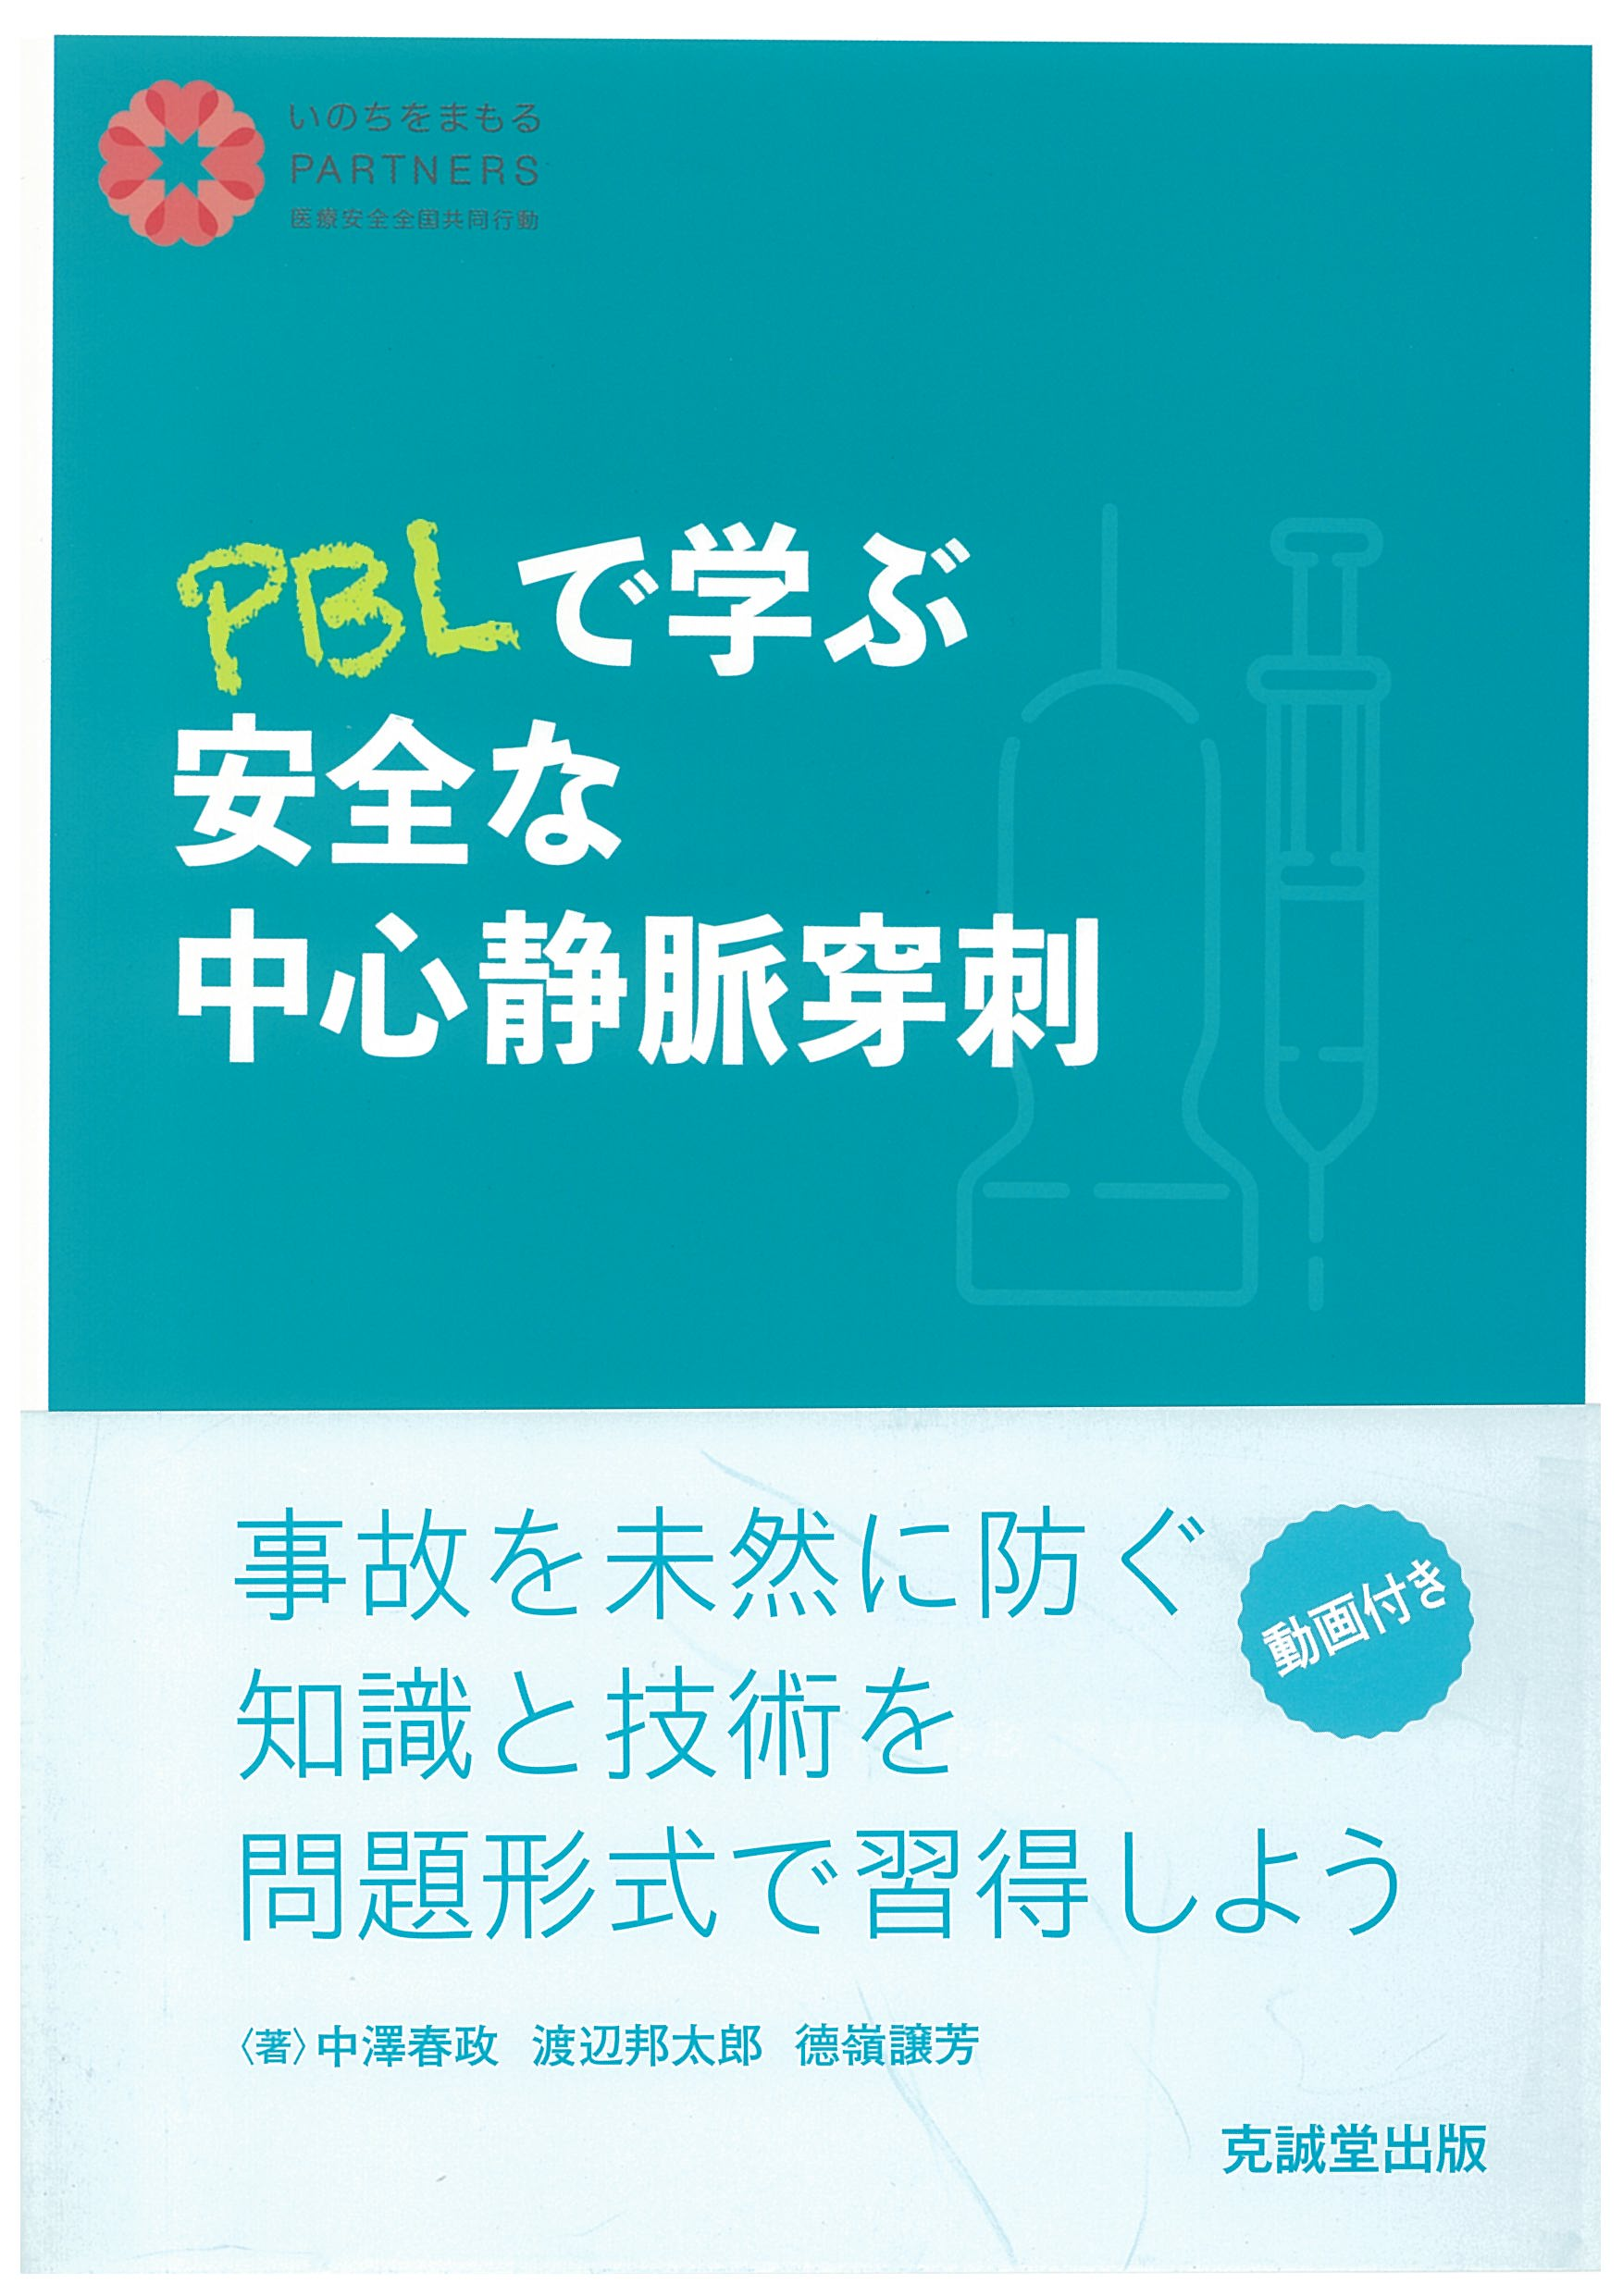 PBLで学ぶ安全な中心静脈穿刺